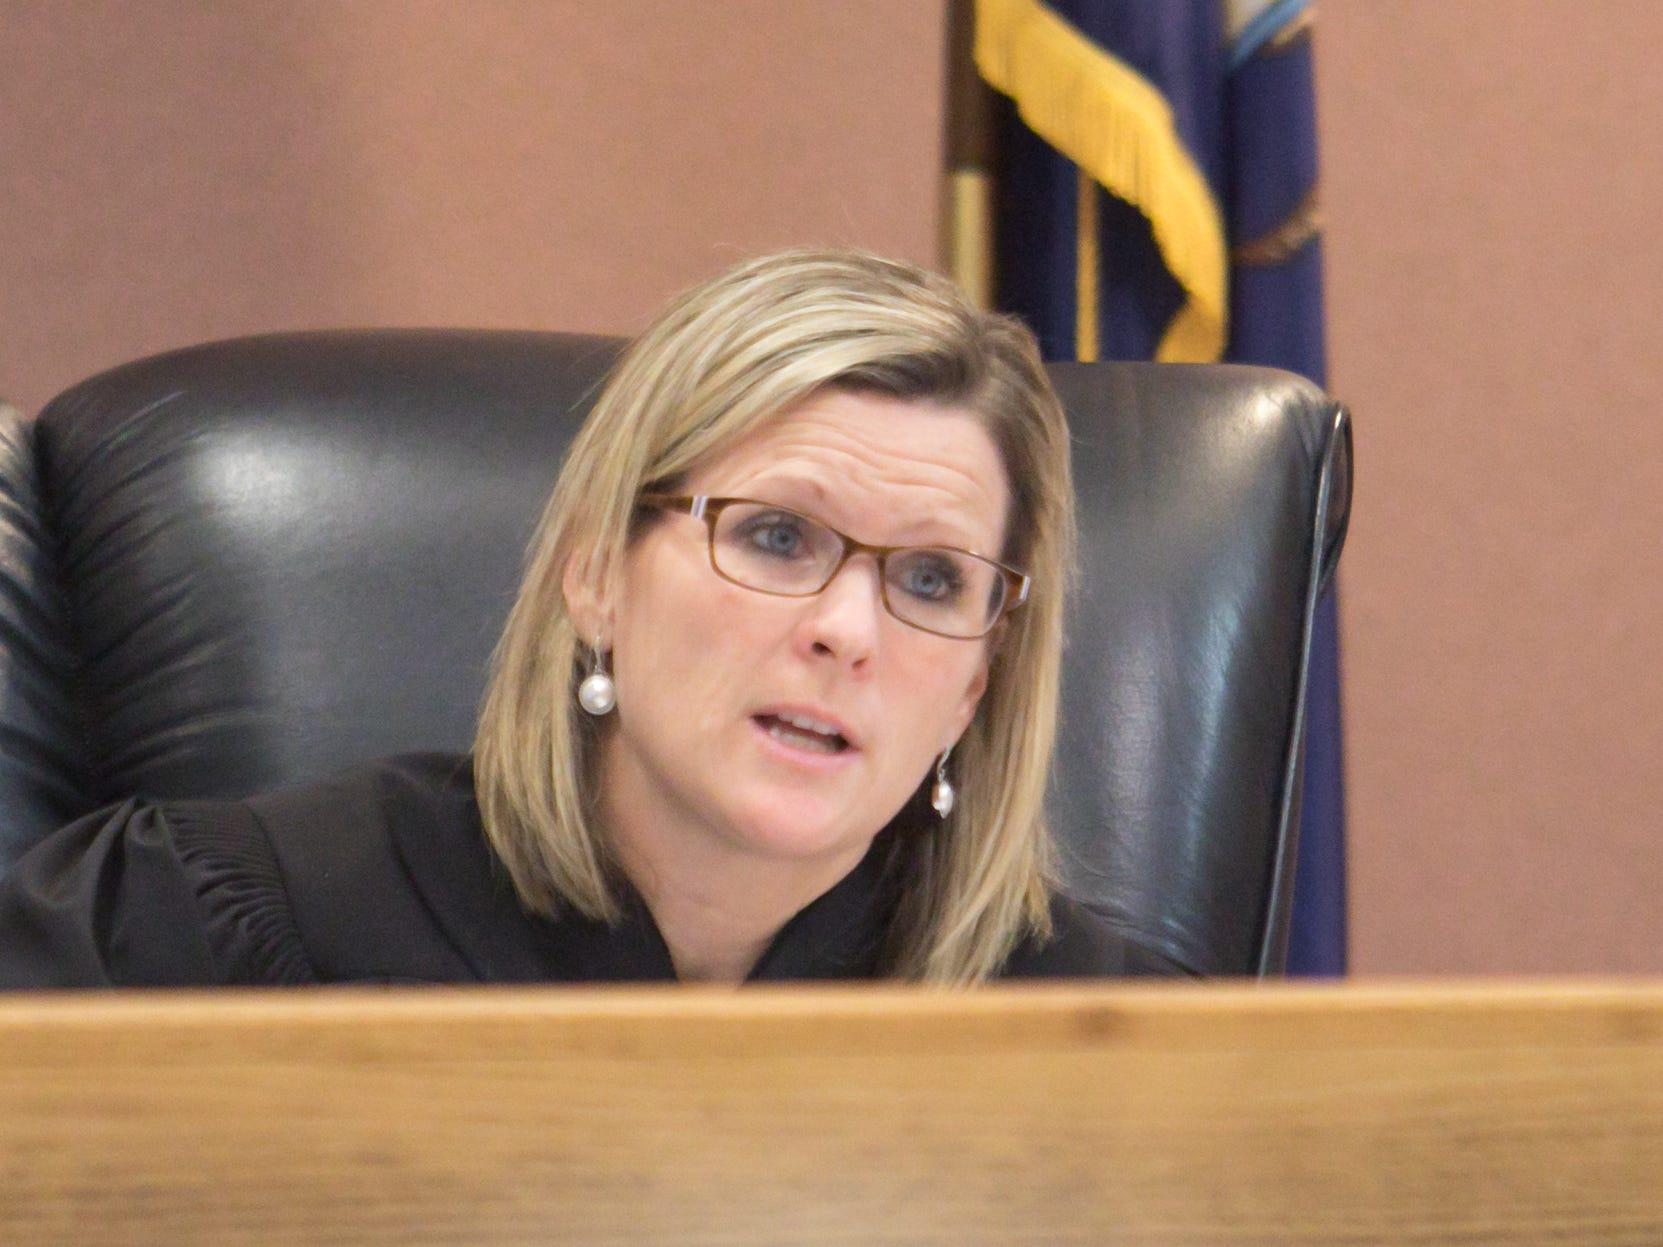 Livingston County Chief Judge Miriam Cavanaugh presides over the sentencing hearing of Michael Mapes Thursday, Feb. 21, 2019.